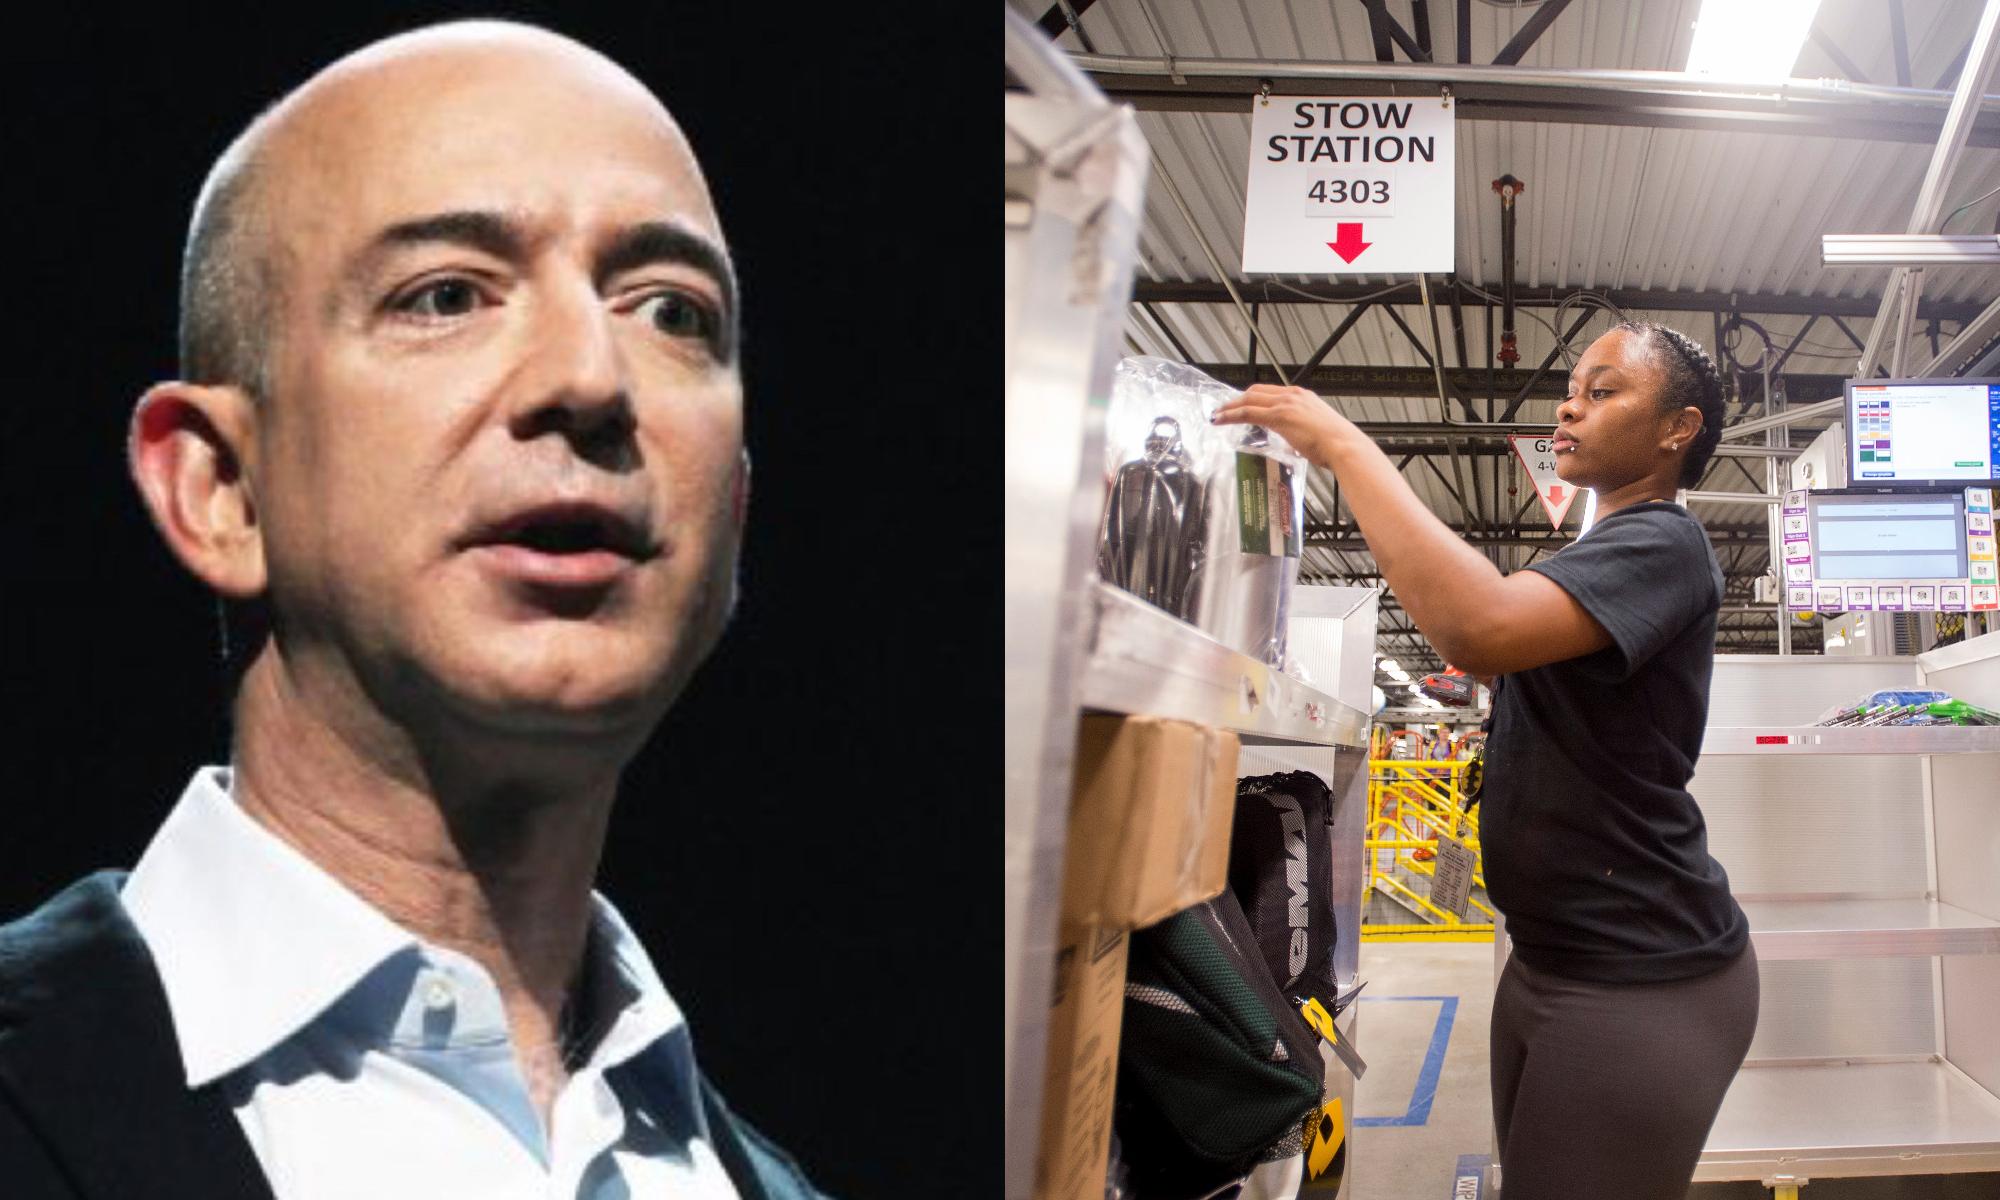 Photo of Amazon robber baron Jeff Bezos' abusive labor practices